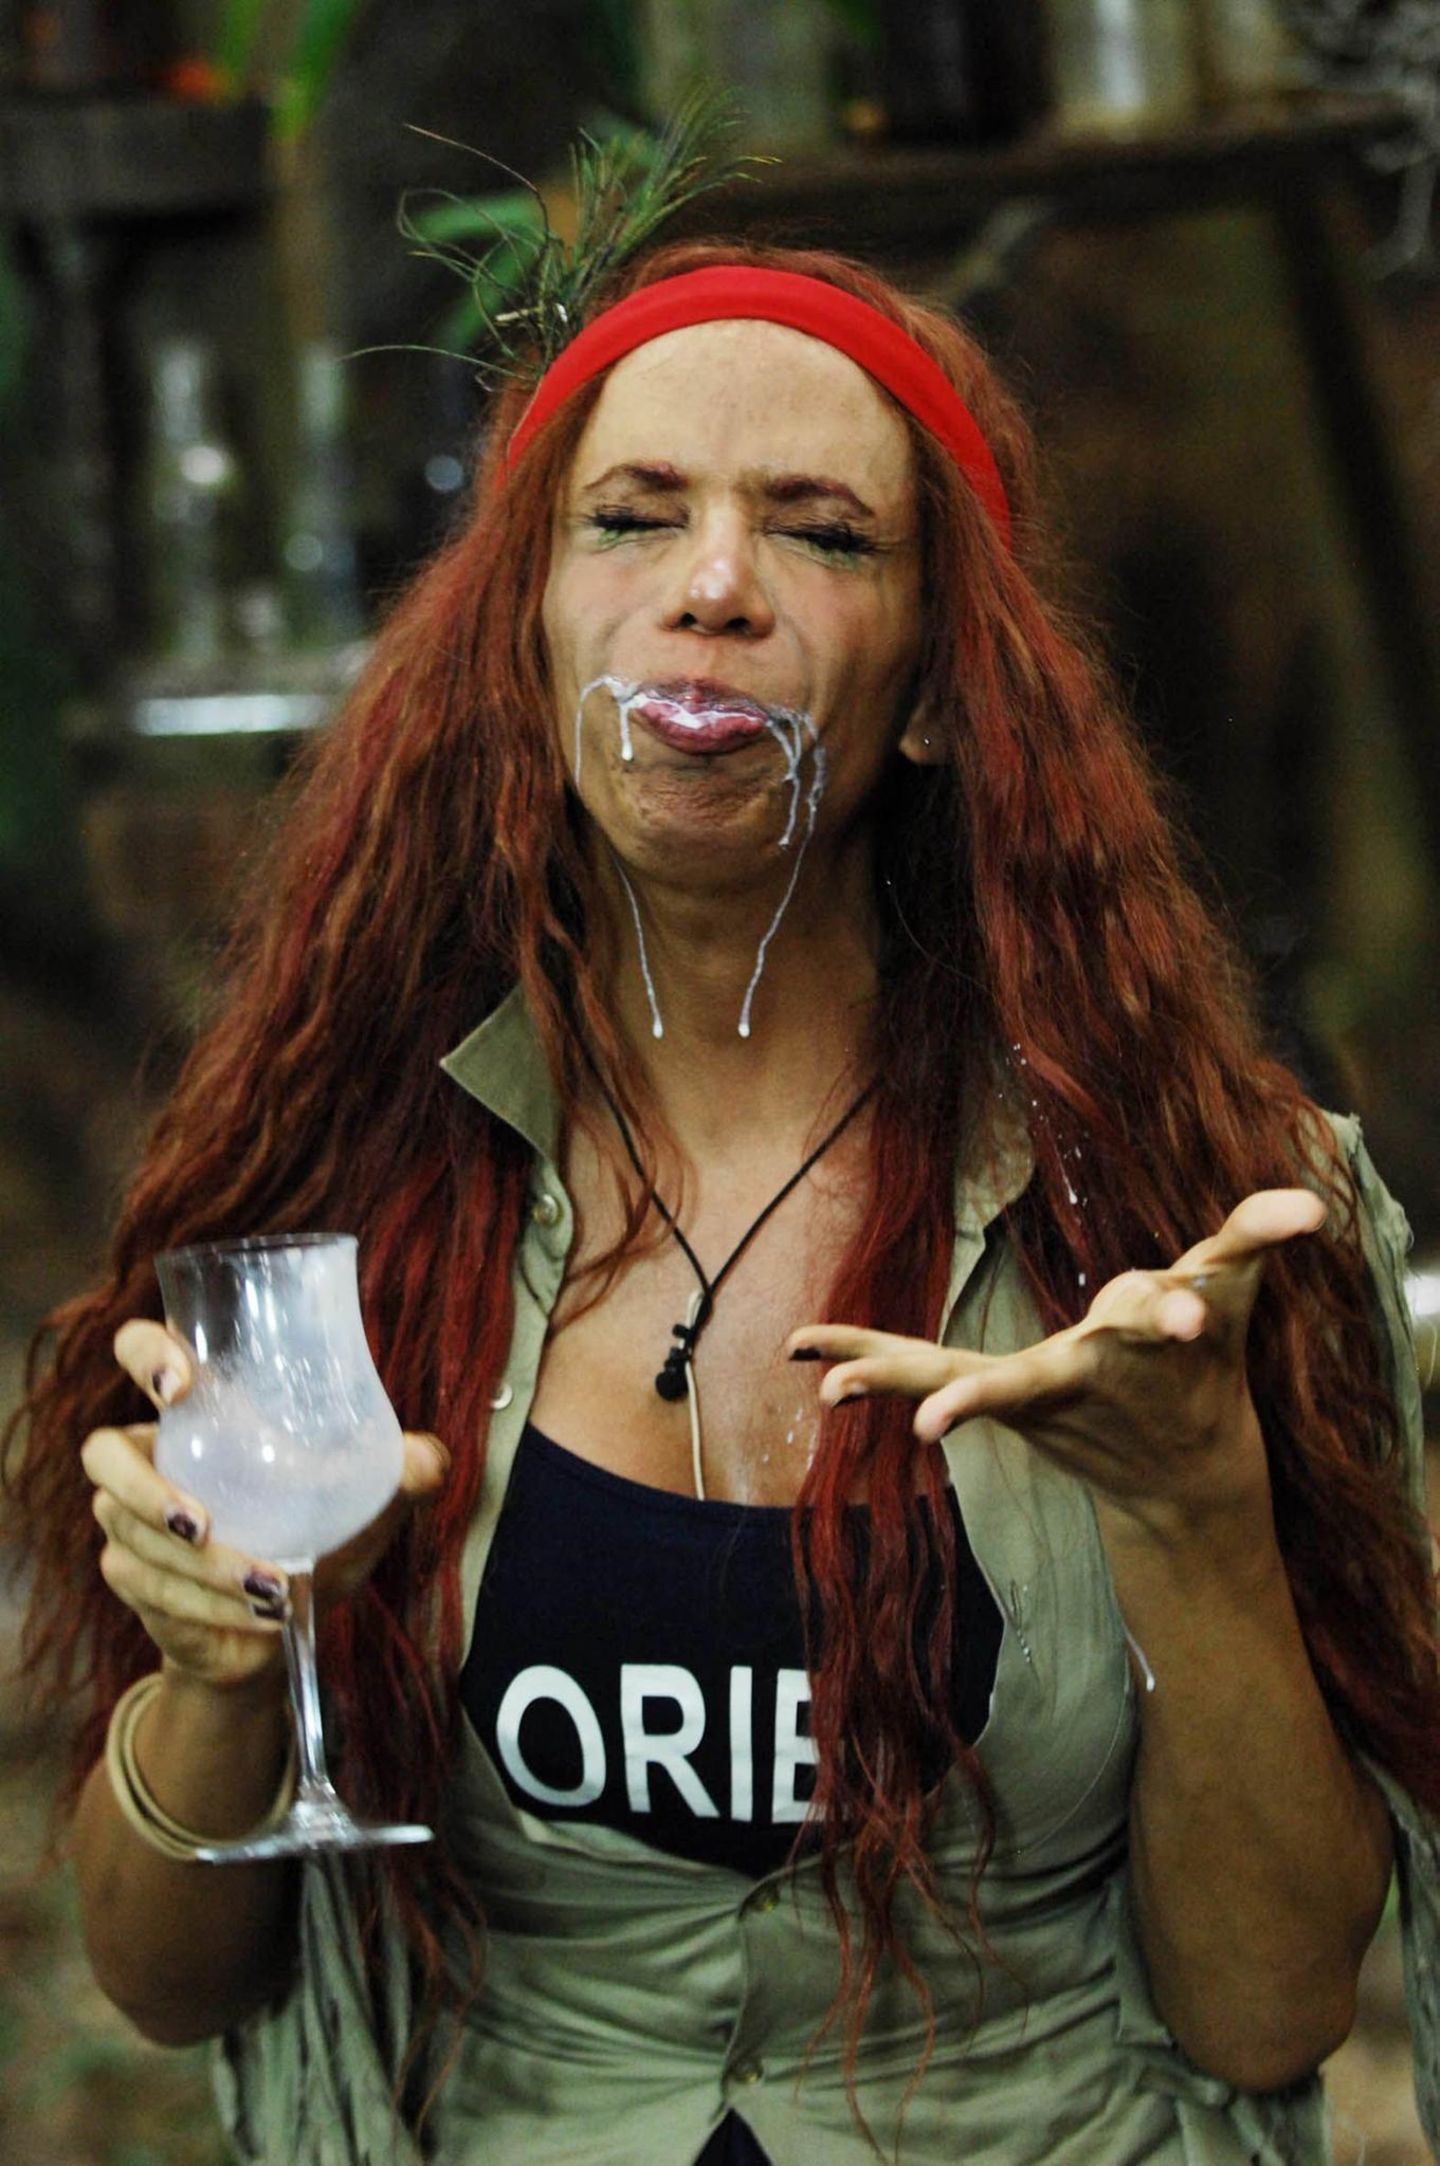 Dschungelcamp: Lorielle London trinkt